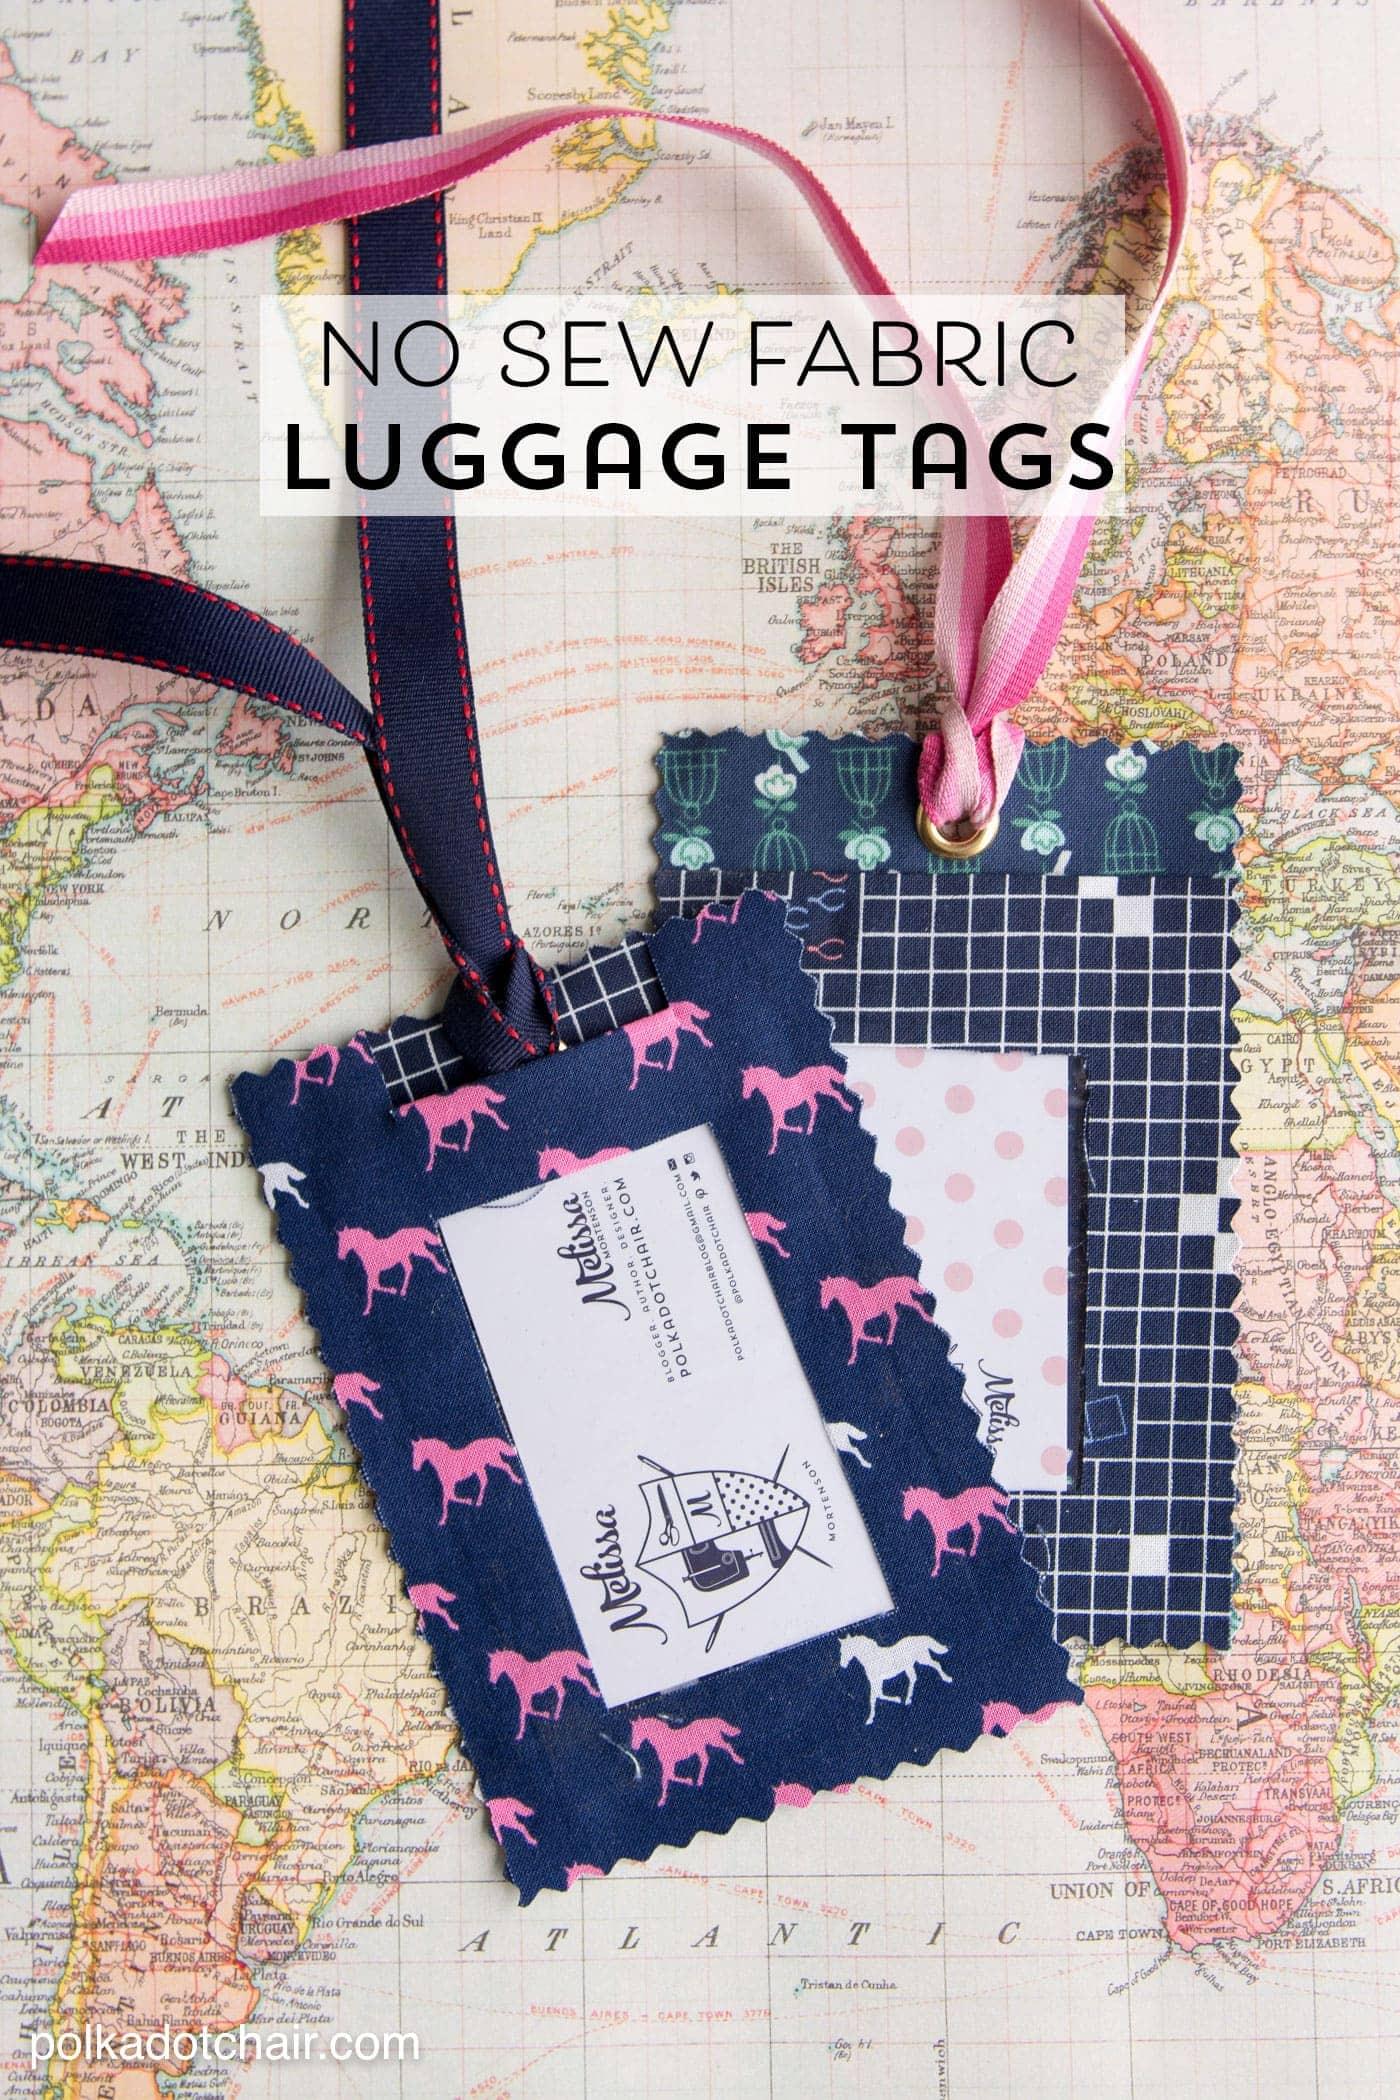 diy fabric luggage tags no sew the polka dot chair